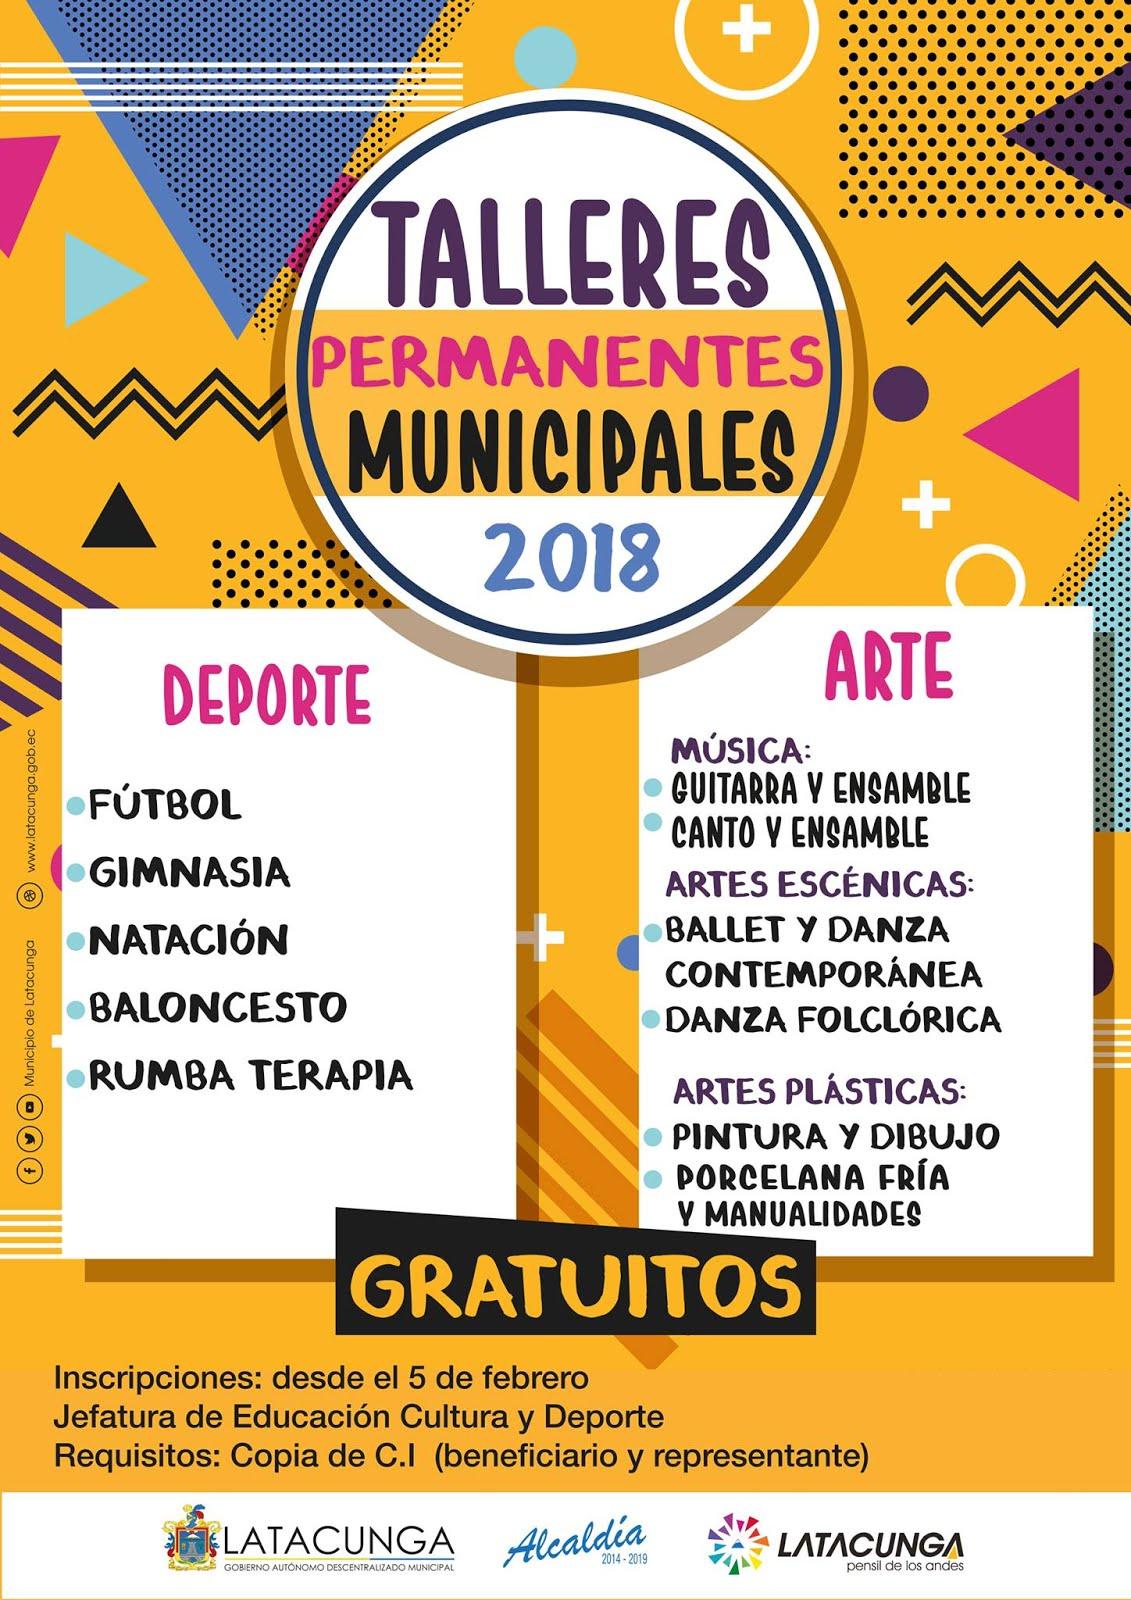 Talleres Permanentes Municipales 2018